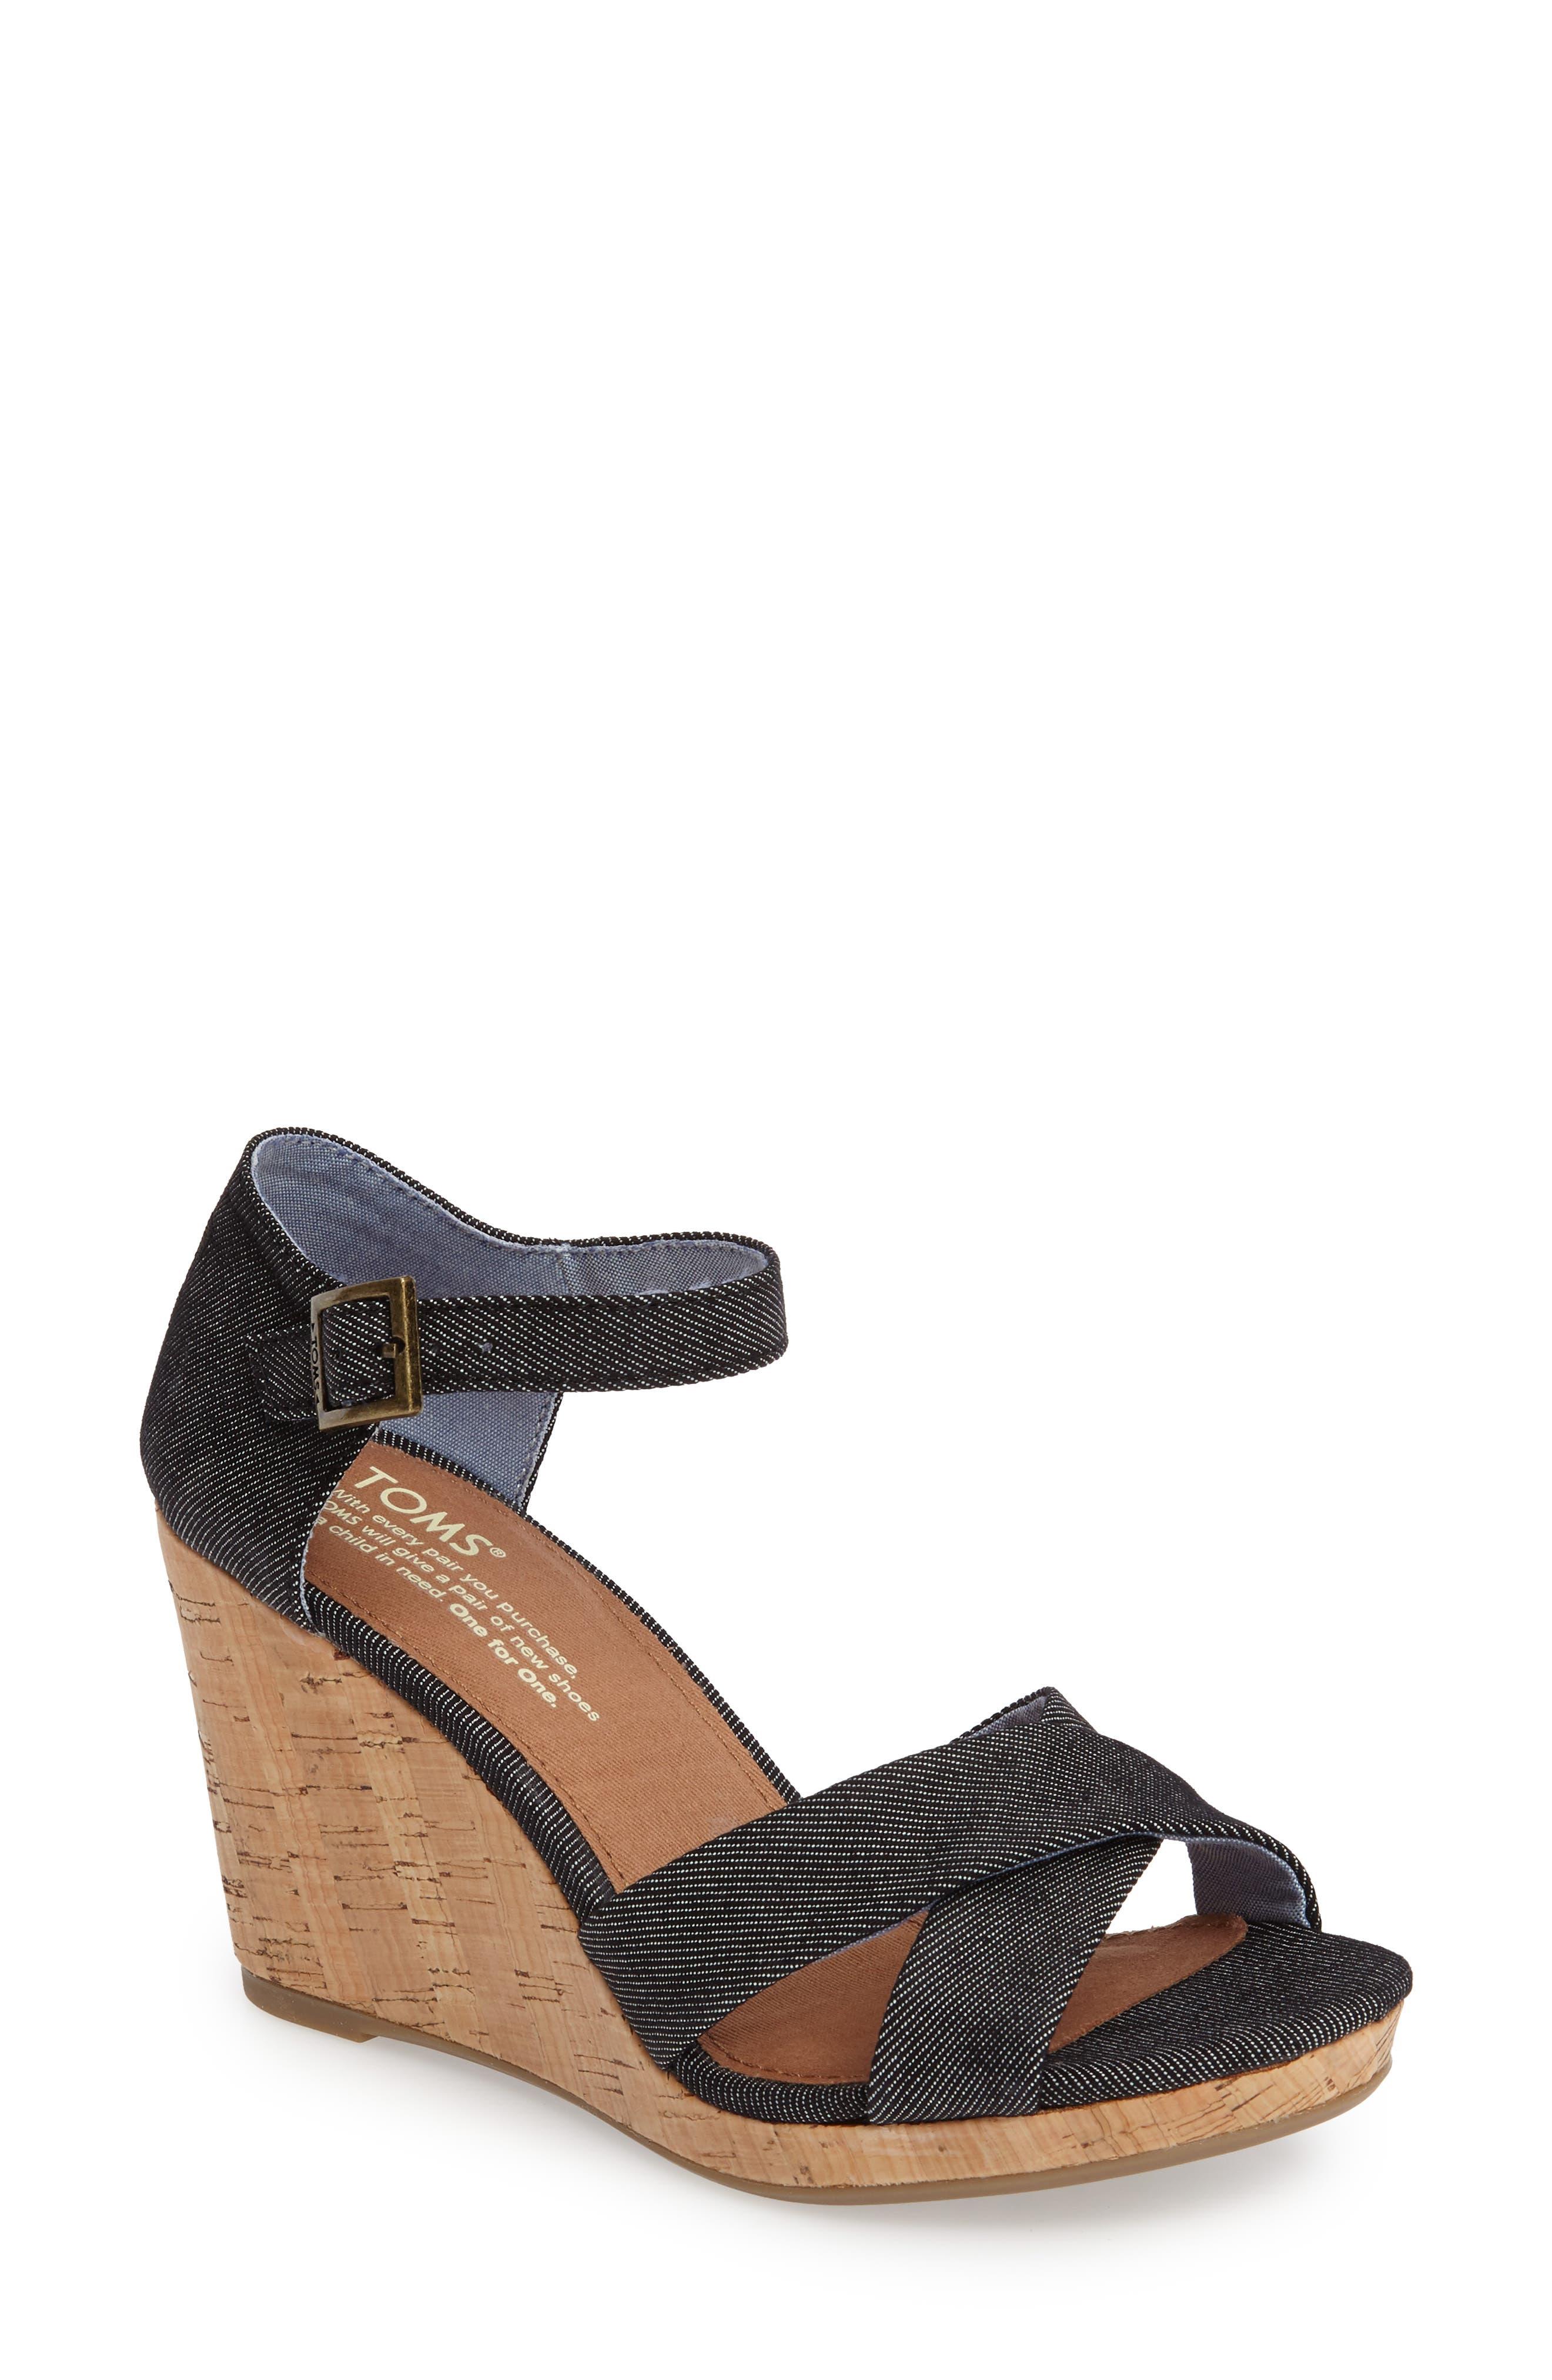 Sienna Wedge Sandal,                             Main thumbnail 1, color,                             001